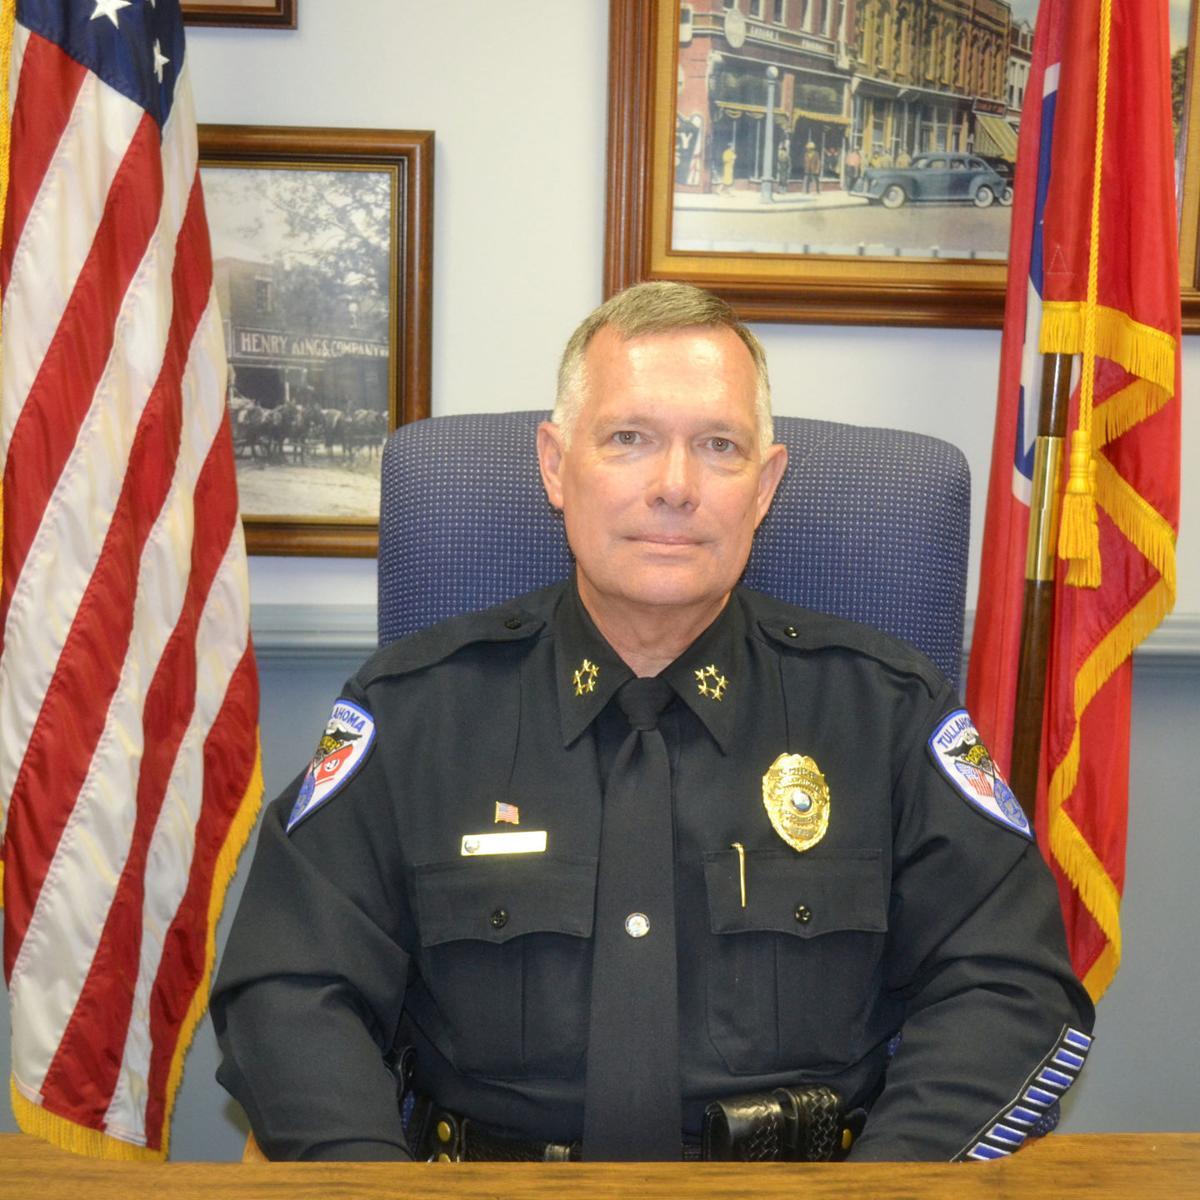 Chief Blackwell